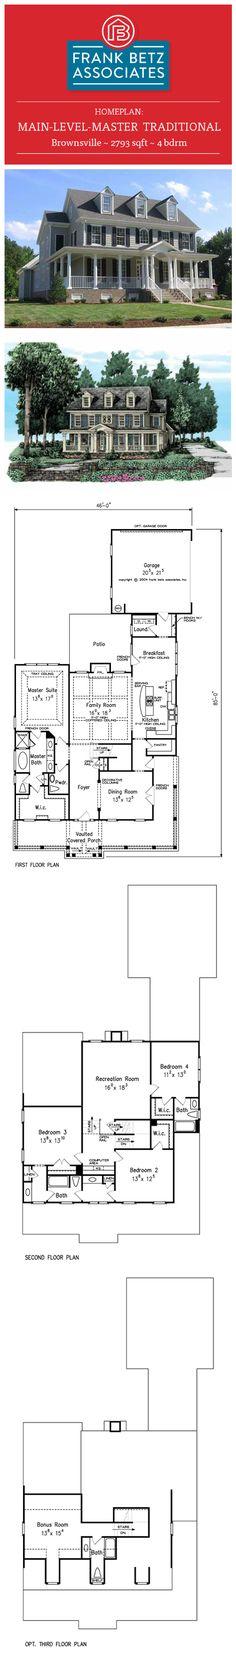 Brownsville: 2793 sqft, 4 bdrm, main-level-master Traditional English house plan design by Frank Betz Associates Inc.